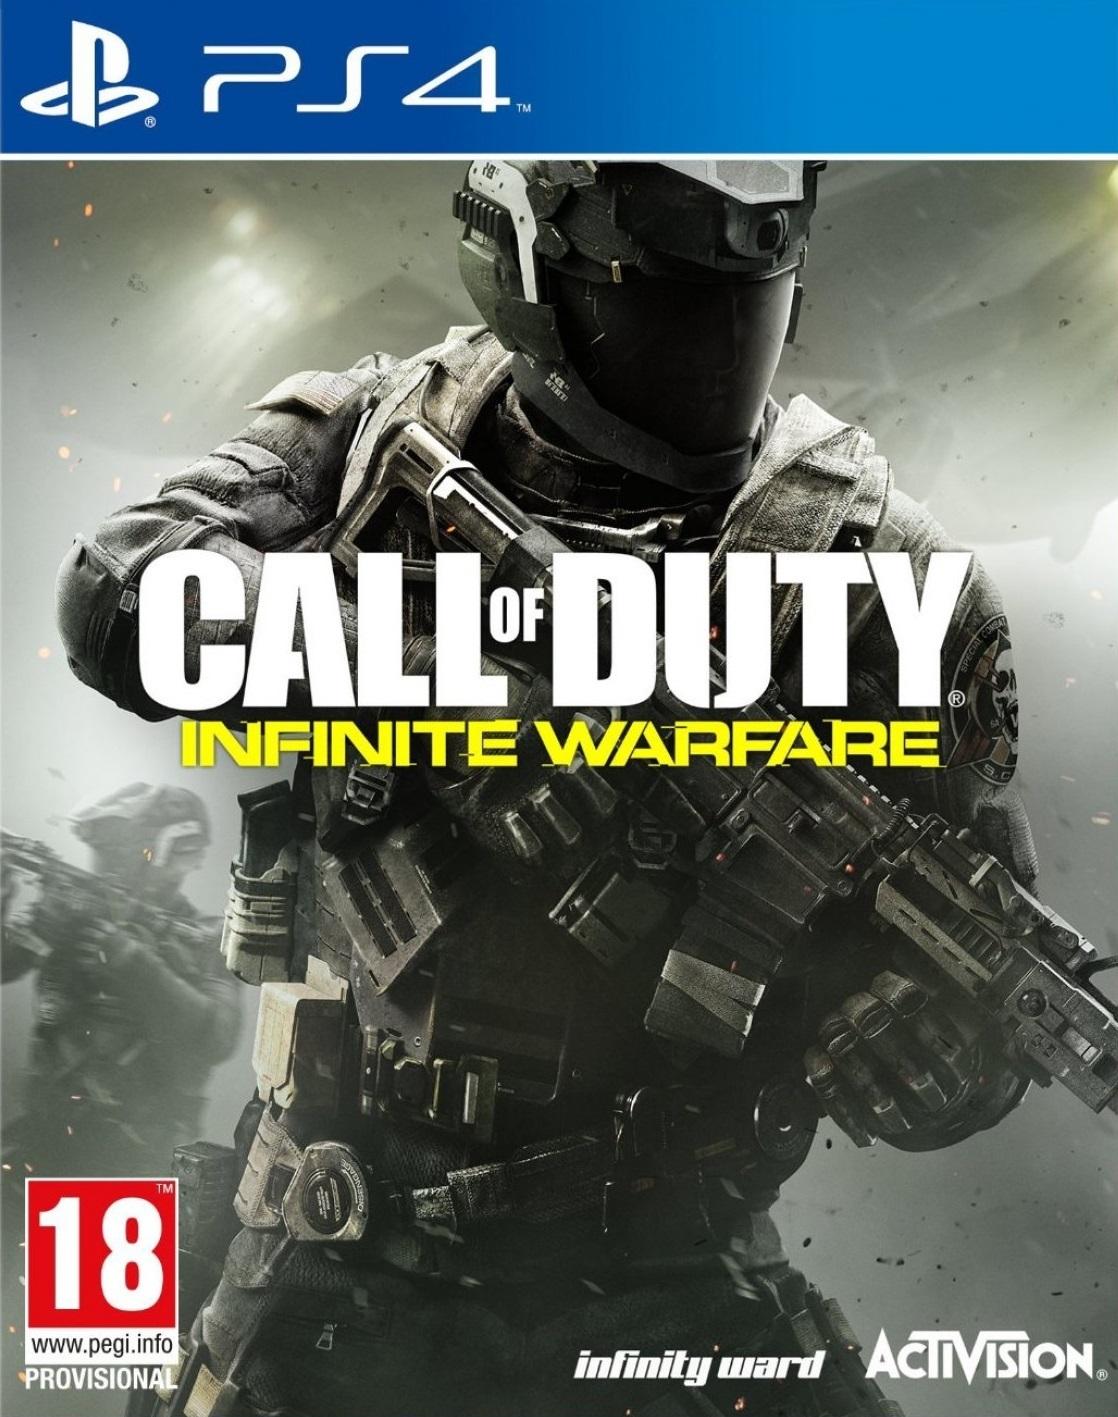 call-of-duty-infinite-warfare-471597.16.jpg